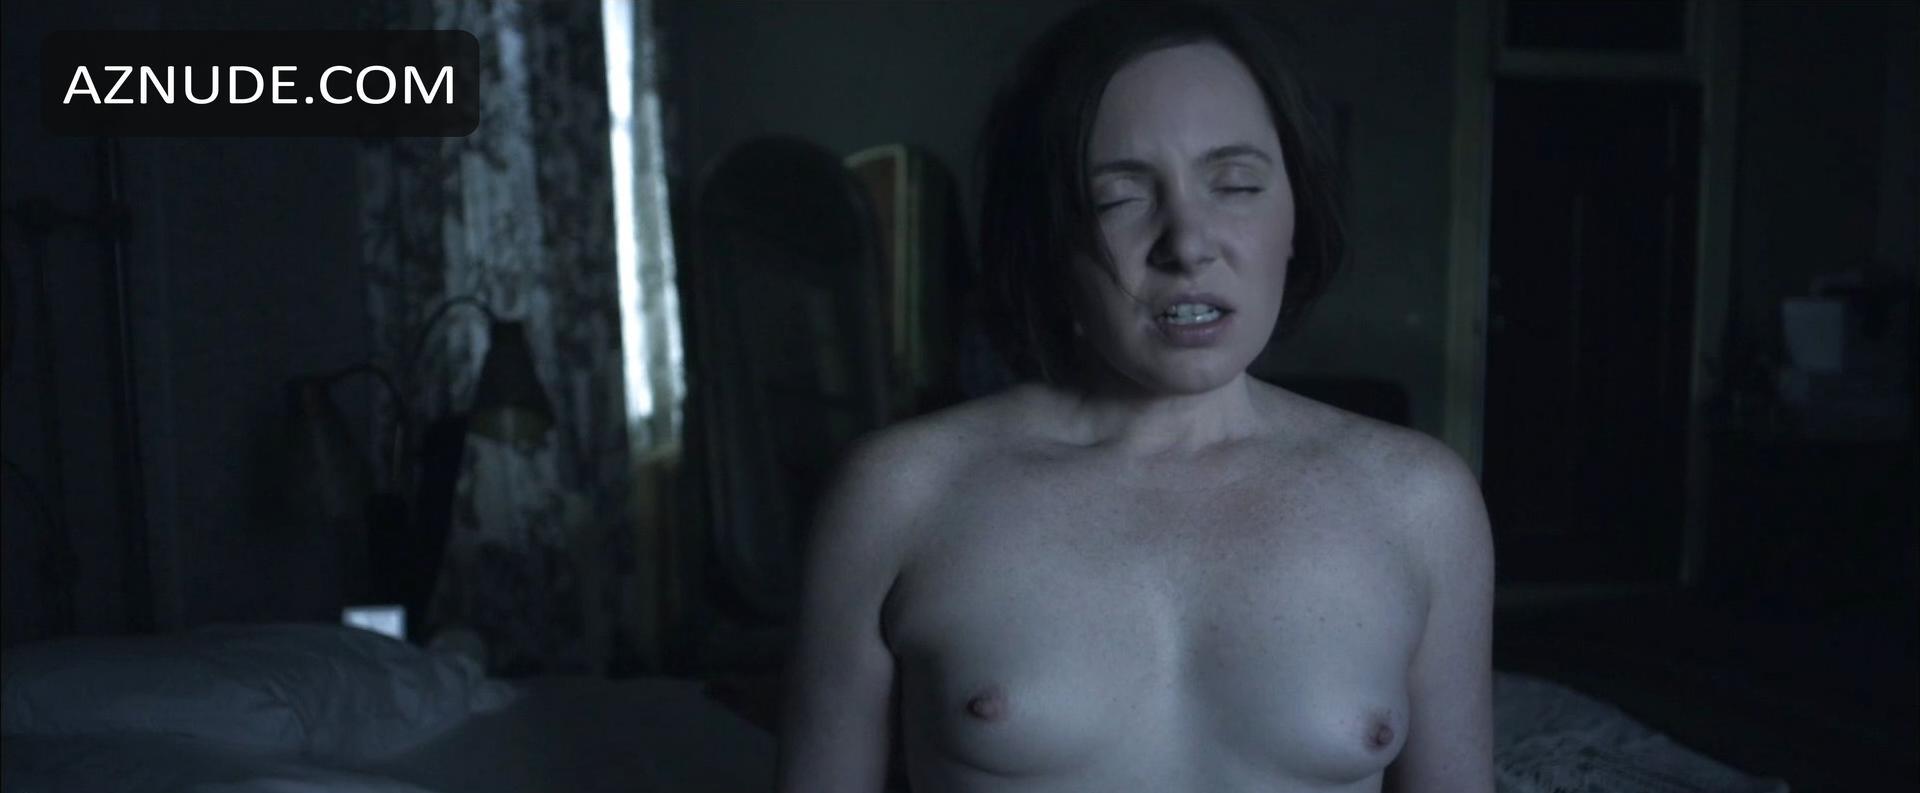 Female hidden masturbation movie upskirt